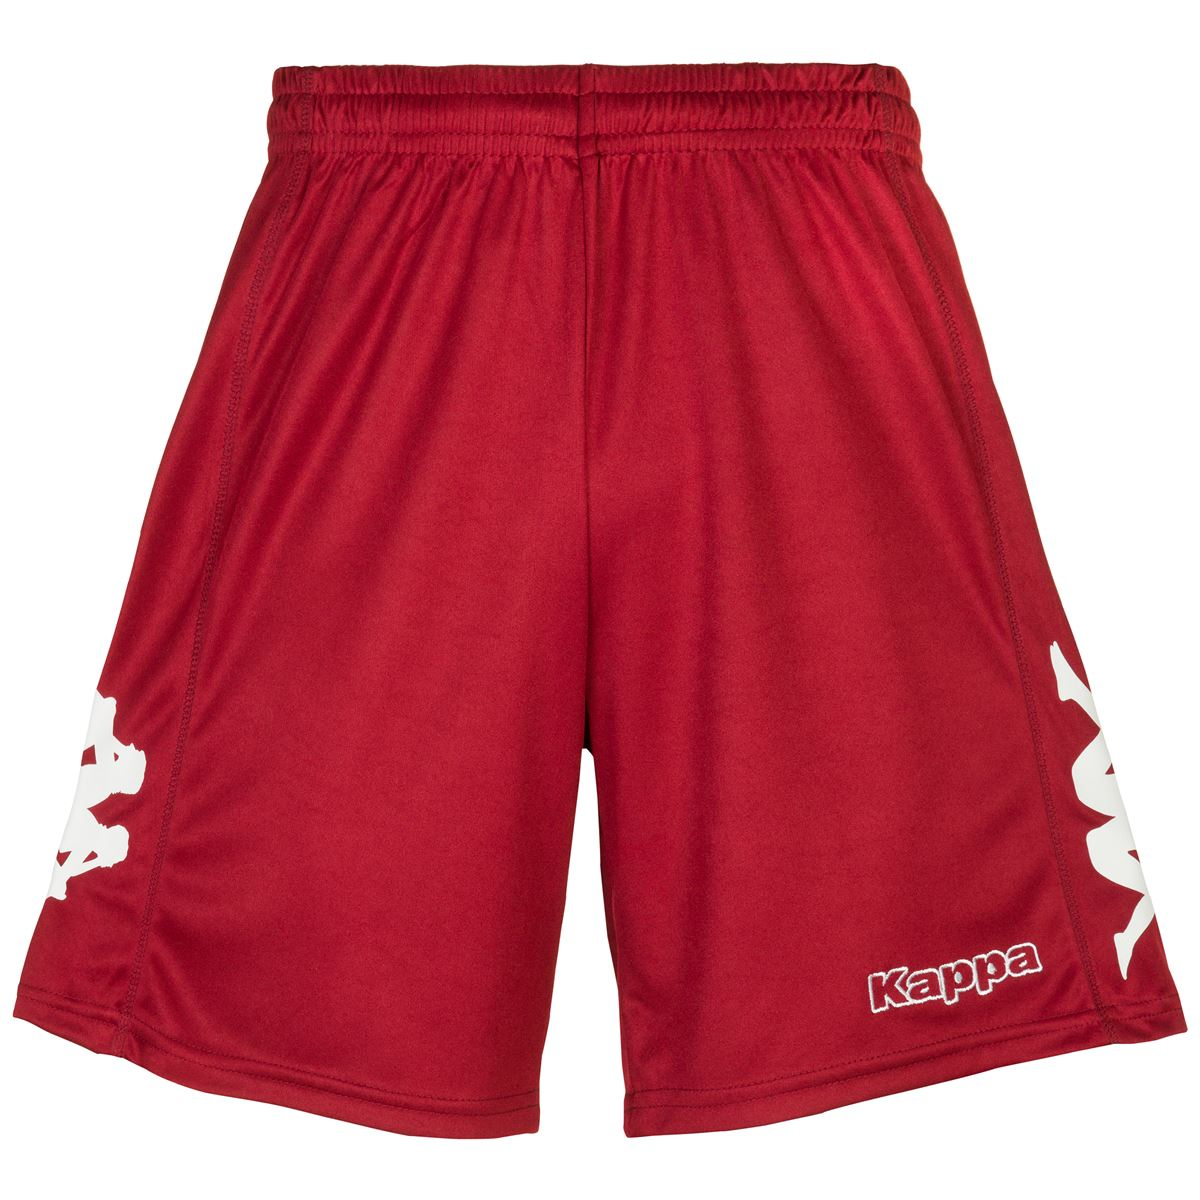 Kappa SPORT SHORTS Shorts Soccer sport Man